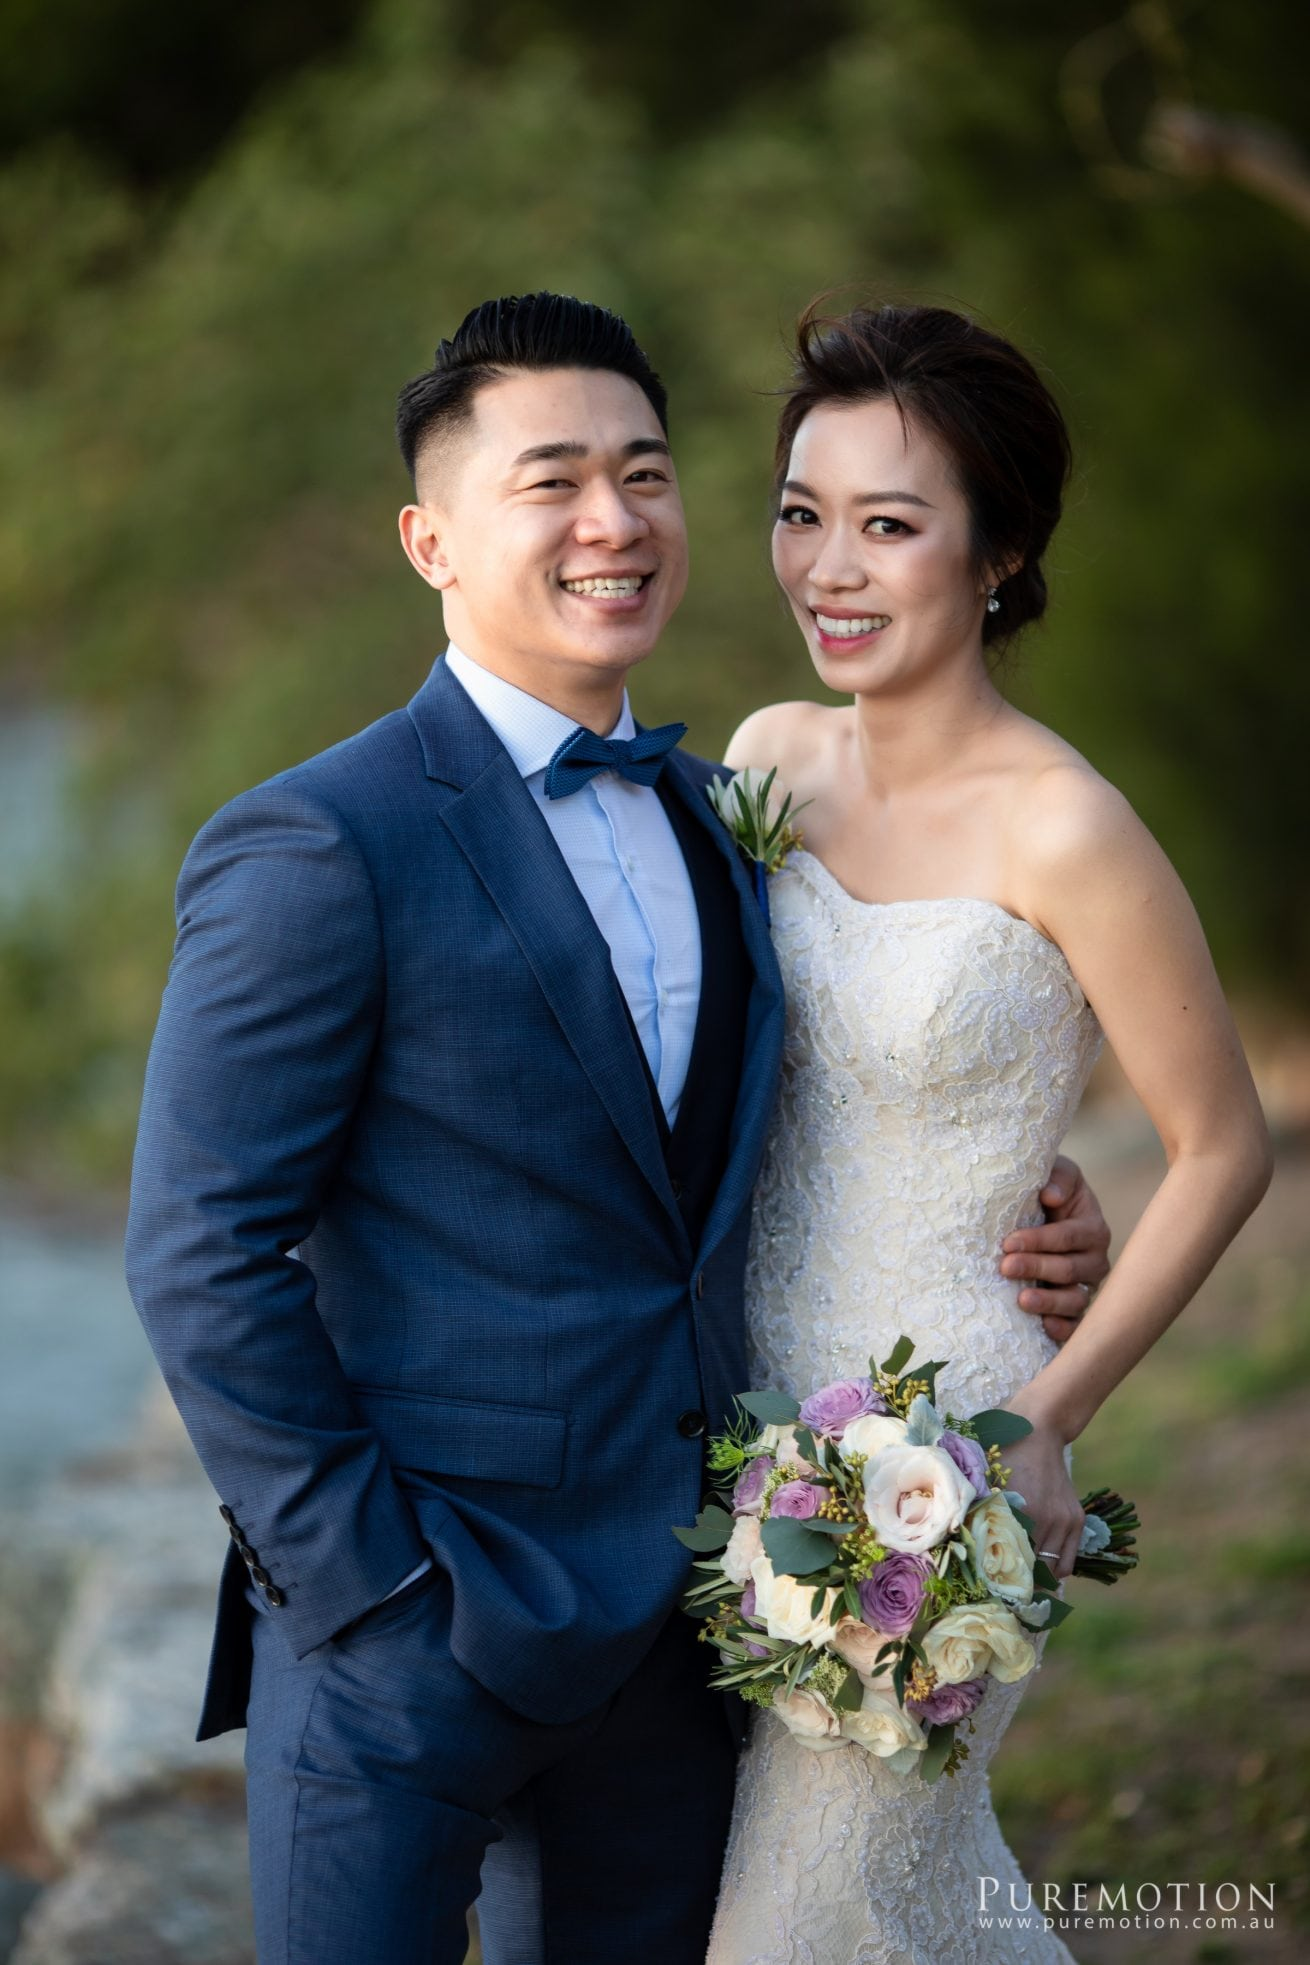 Puremotion Wedding Photography Alex Huang Brisbane W Hotel100